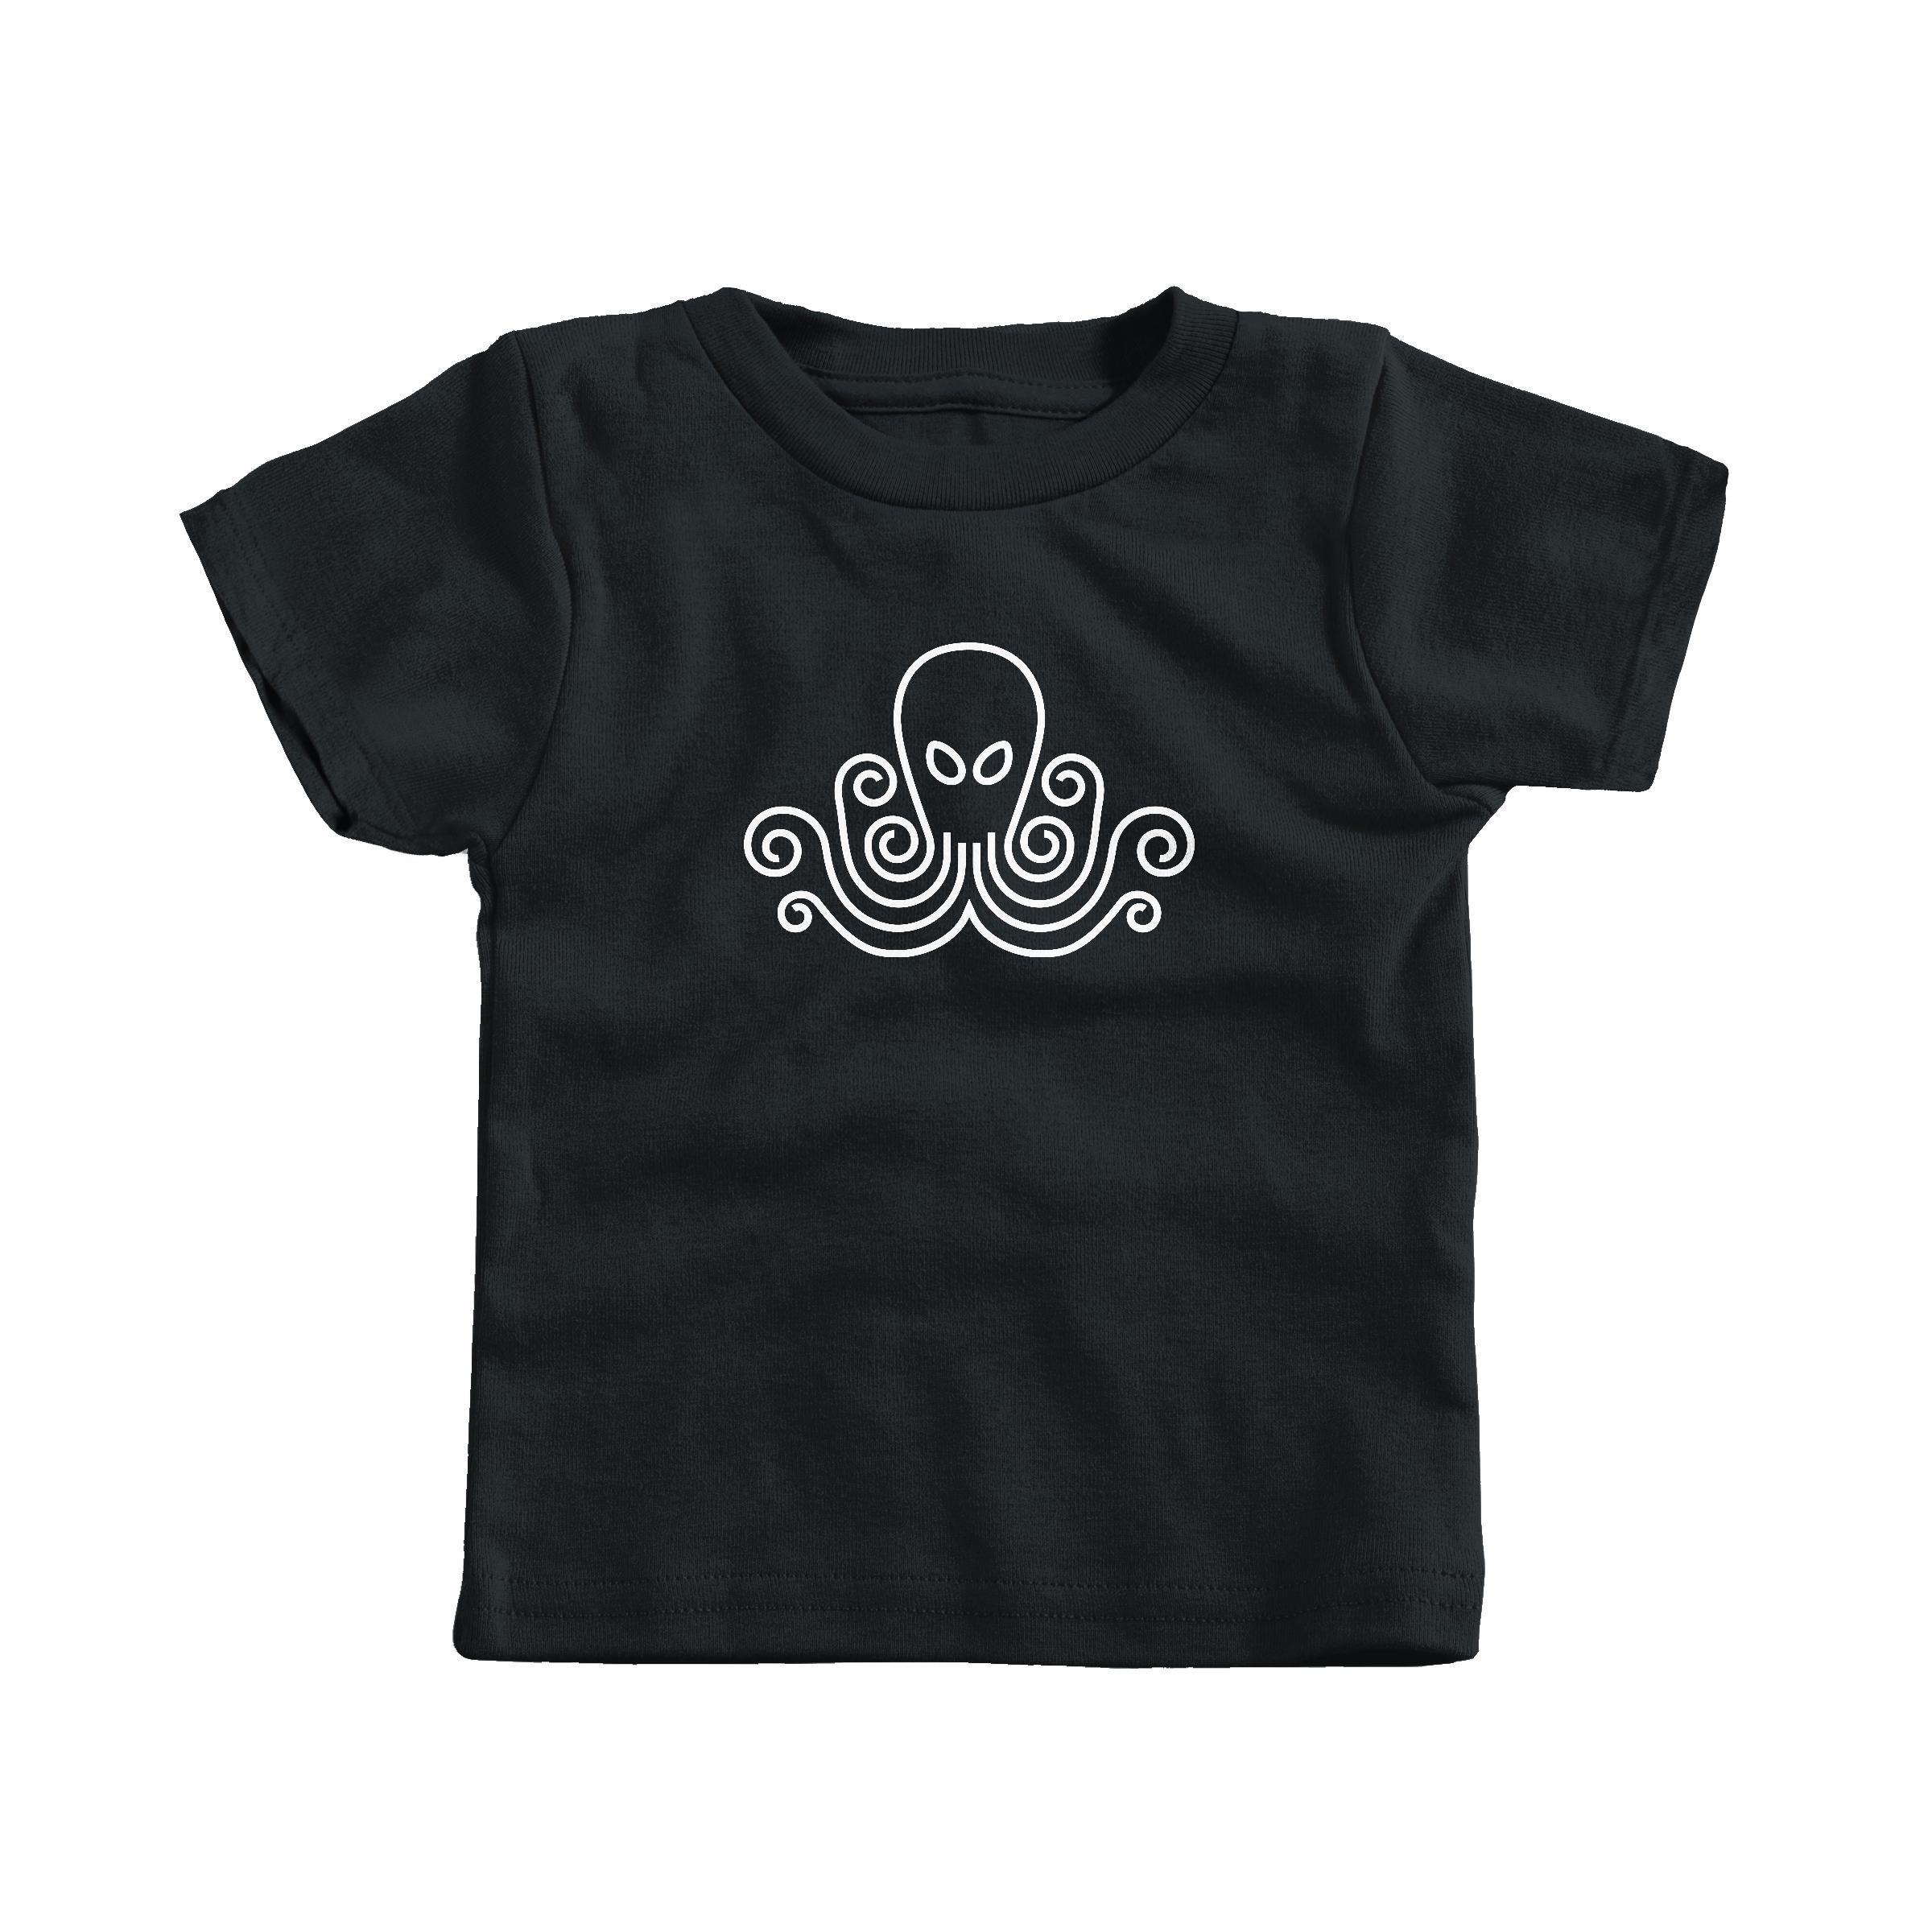 Octopus Black (T-Shirt)